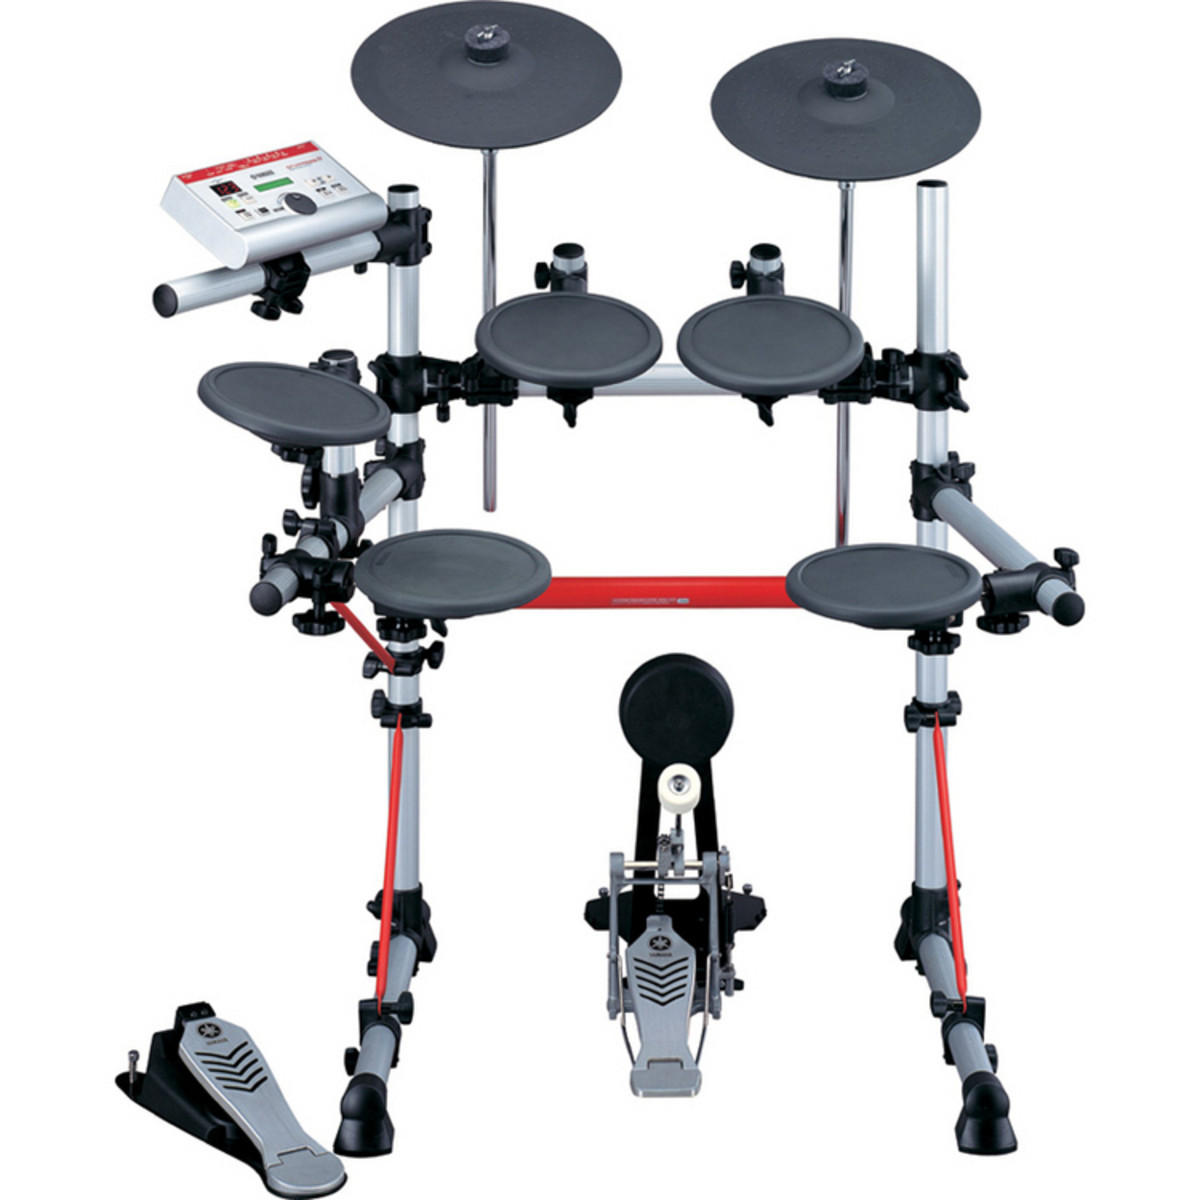 Yamaha Dtxk Electronic Drum Kit Demo